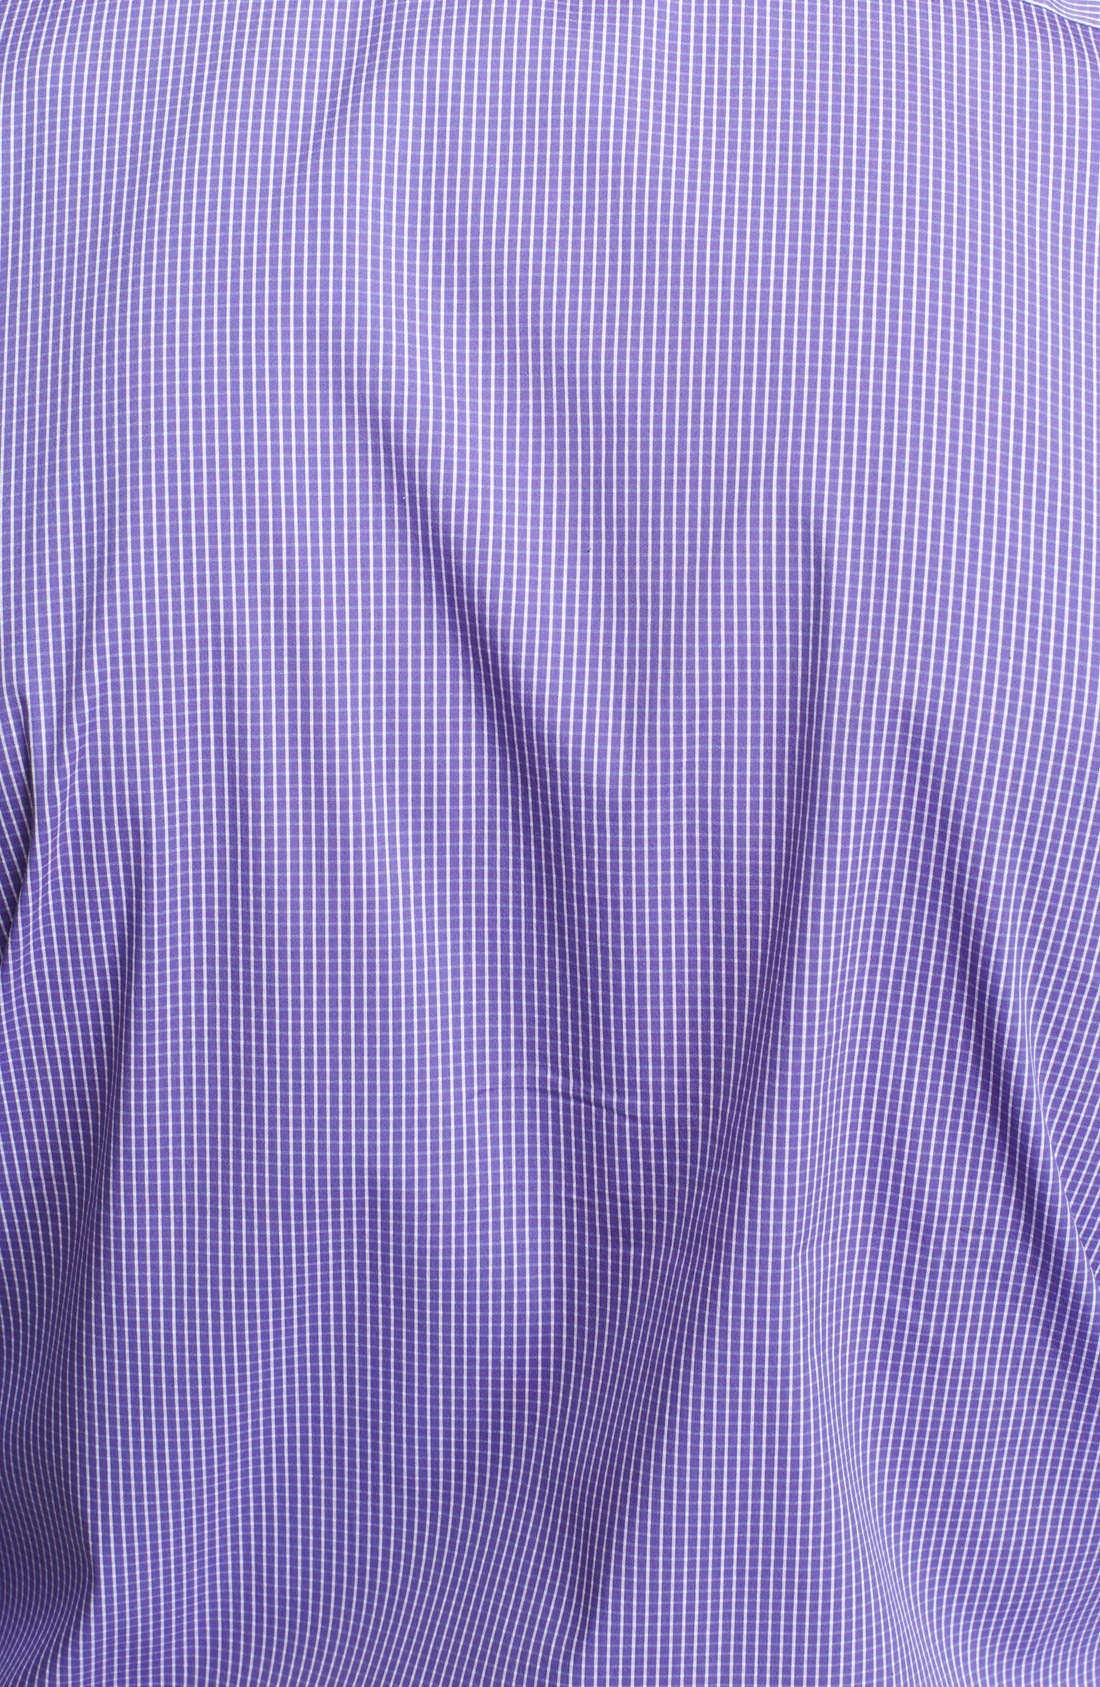 Alternate Image 2  - Ralph Lauren Black Label Trim Fit Stripe Dress Shirt